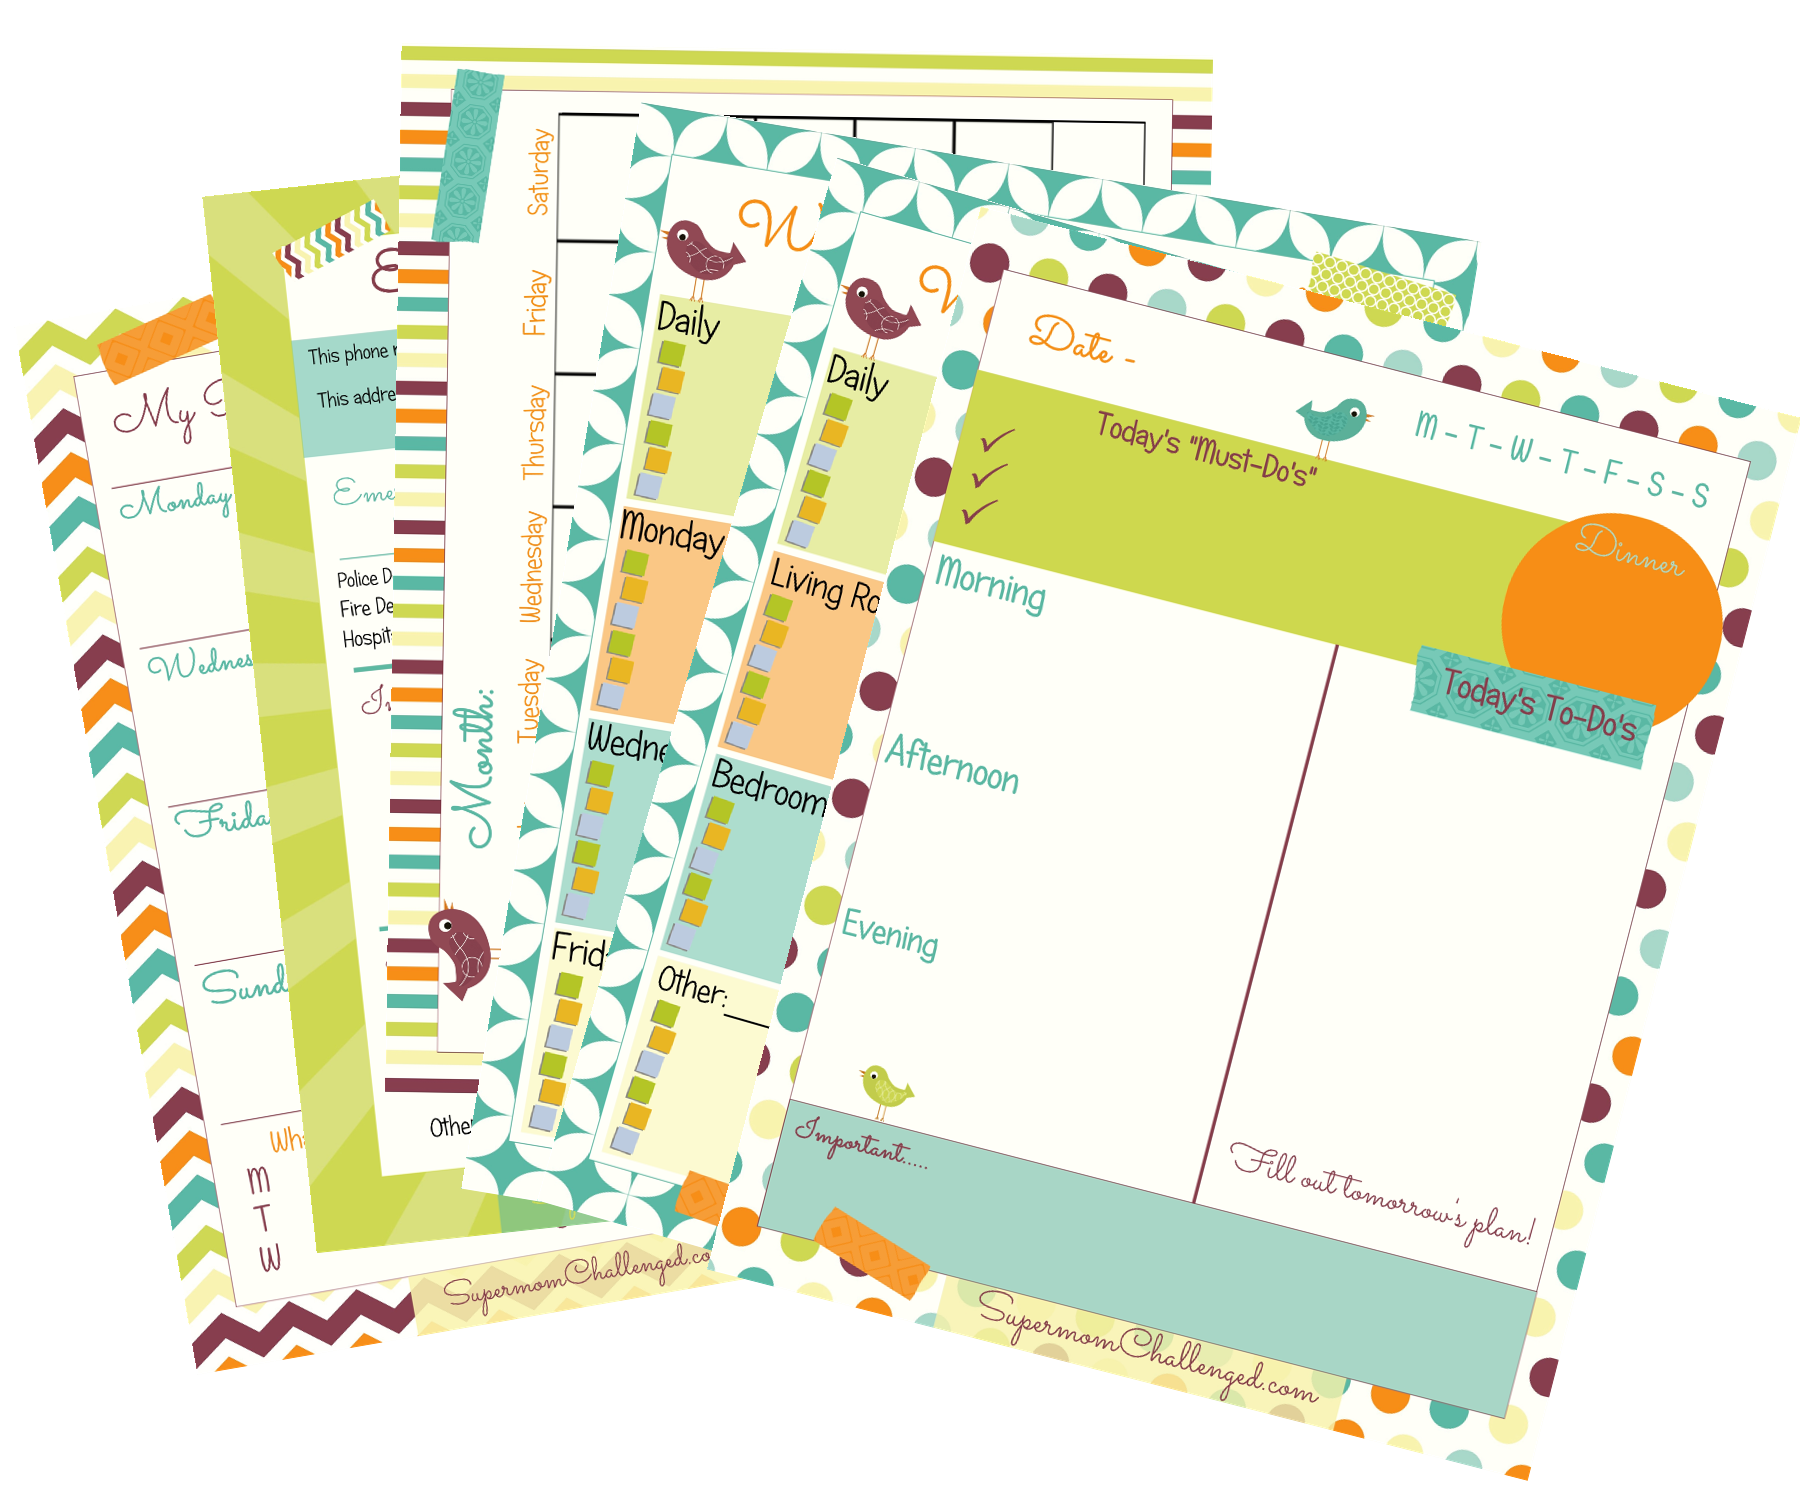 More Free Home Organization Printables